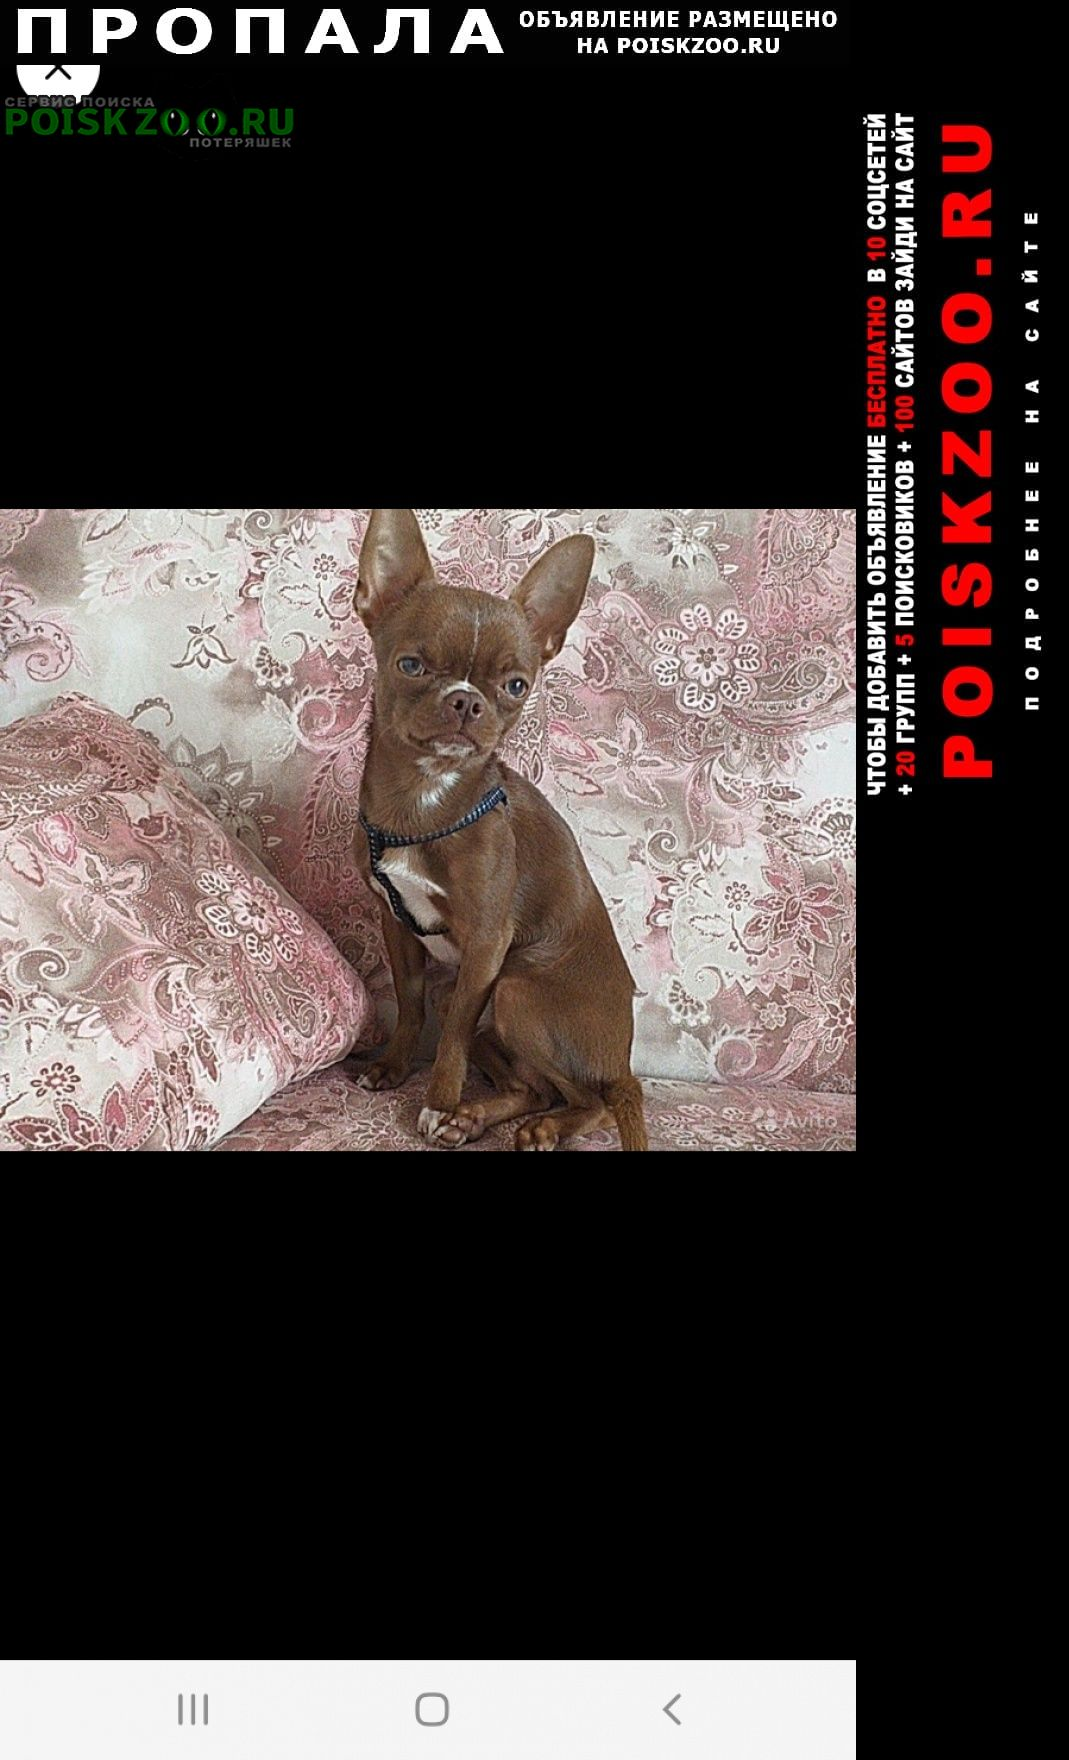 Пропала собака кобель чихуахуа Казань